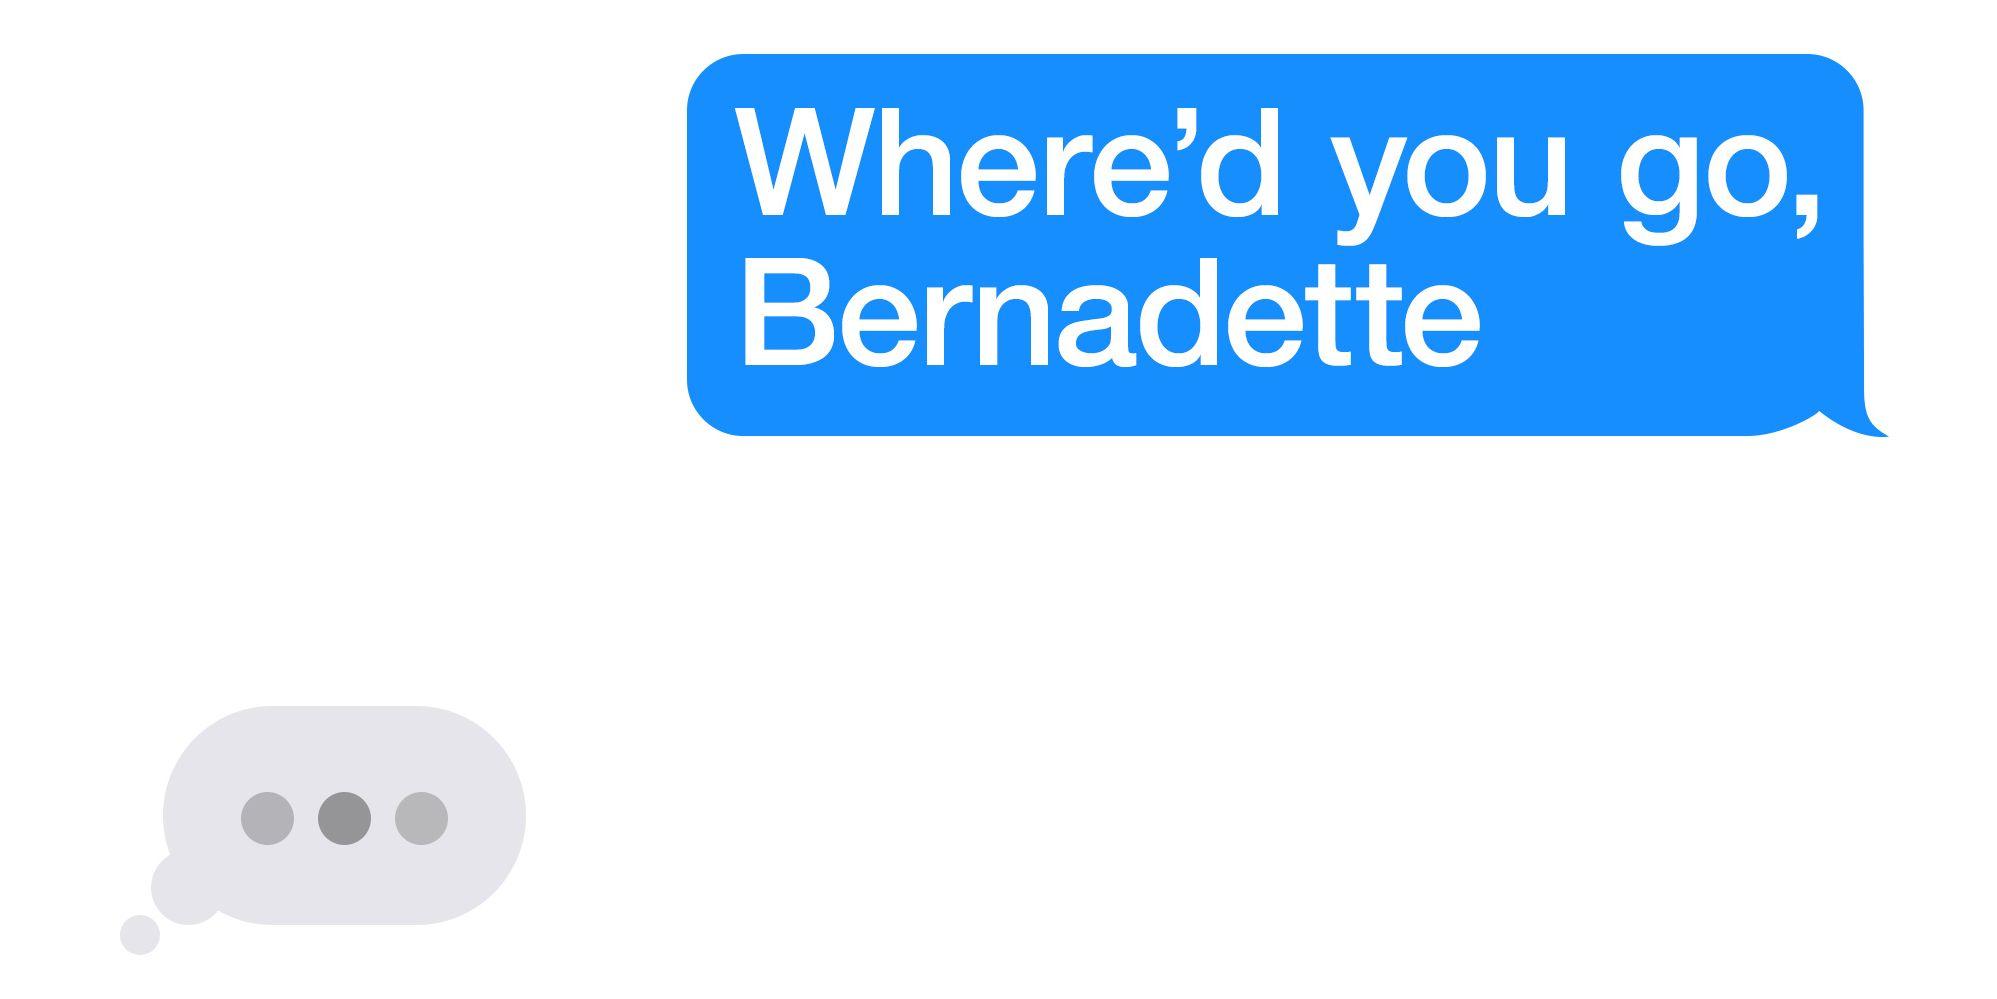 where'd you go bernadette movie trailer poster